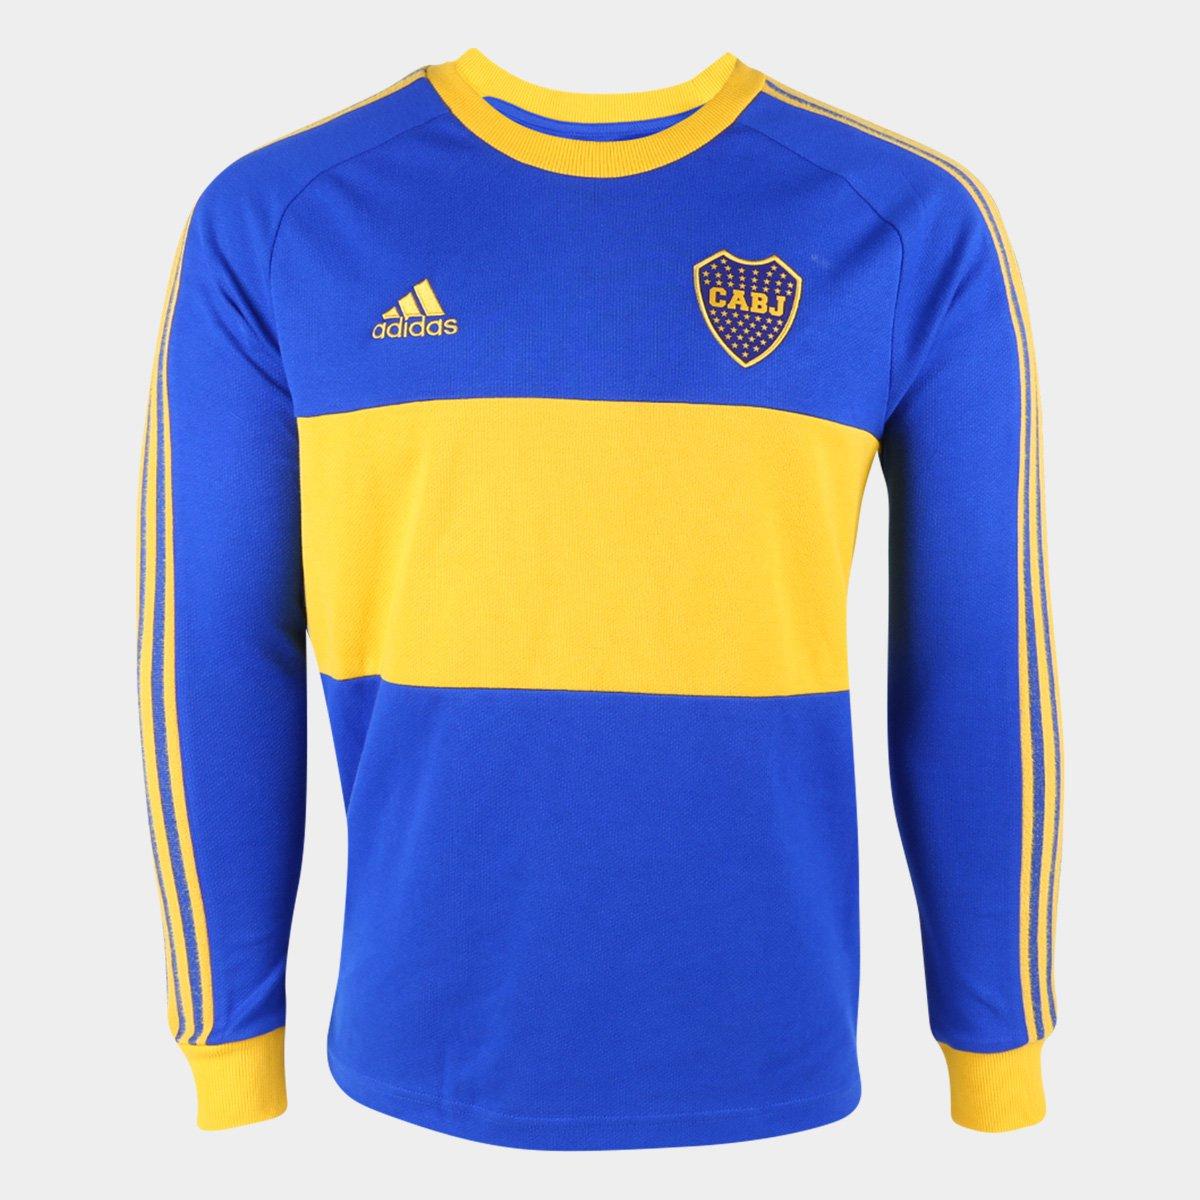 Camiseta Boca Juniors Adidas Manga Longa Masculina